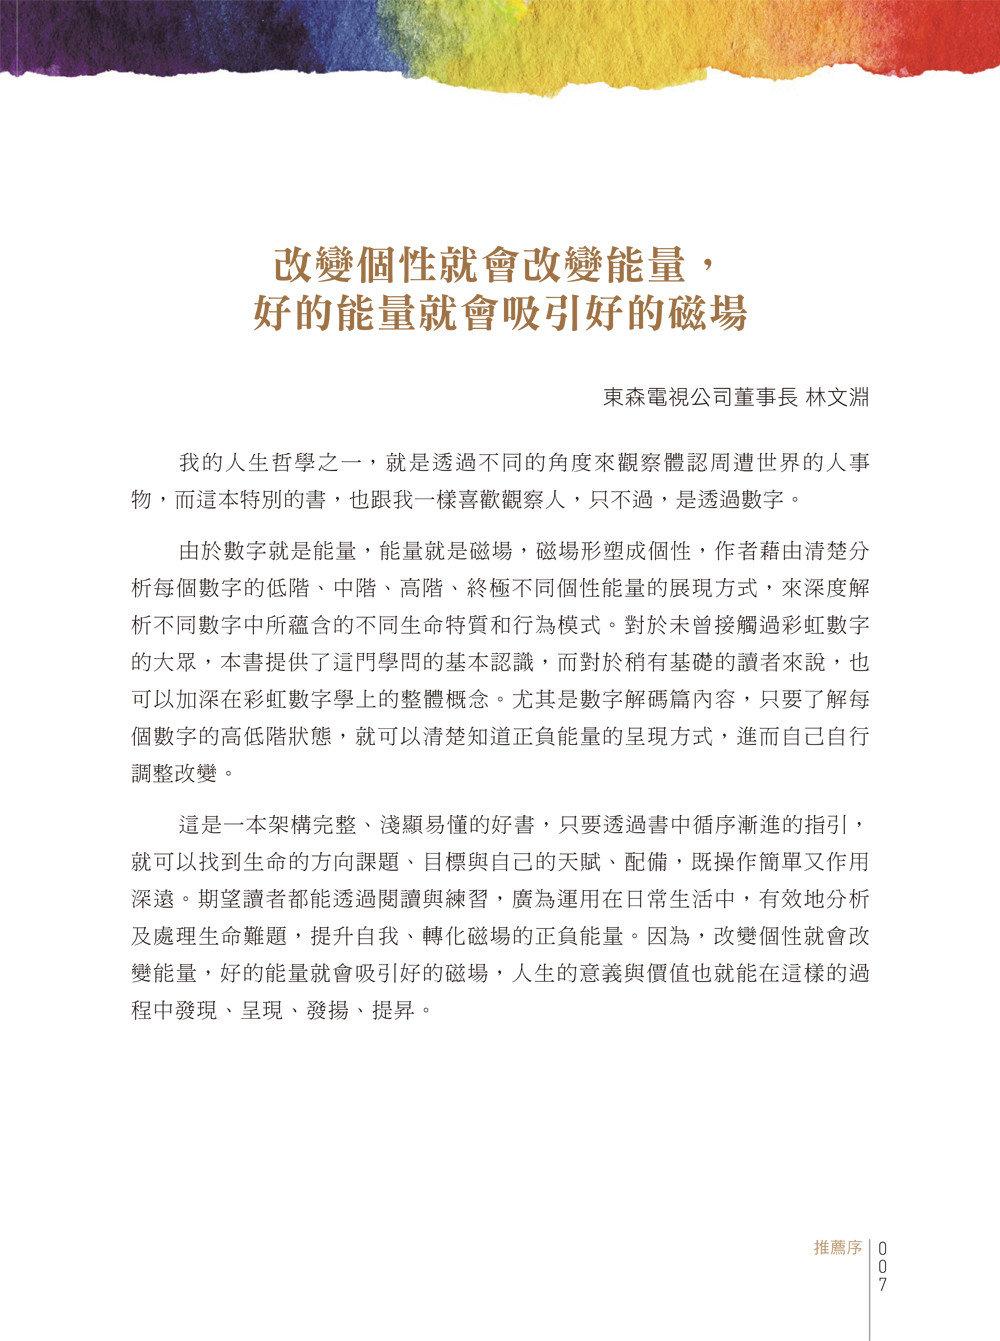 麗子の彩虹數字學:數字解碼與理論基礎-preview-7